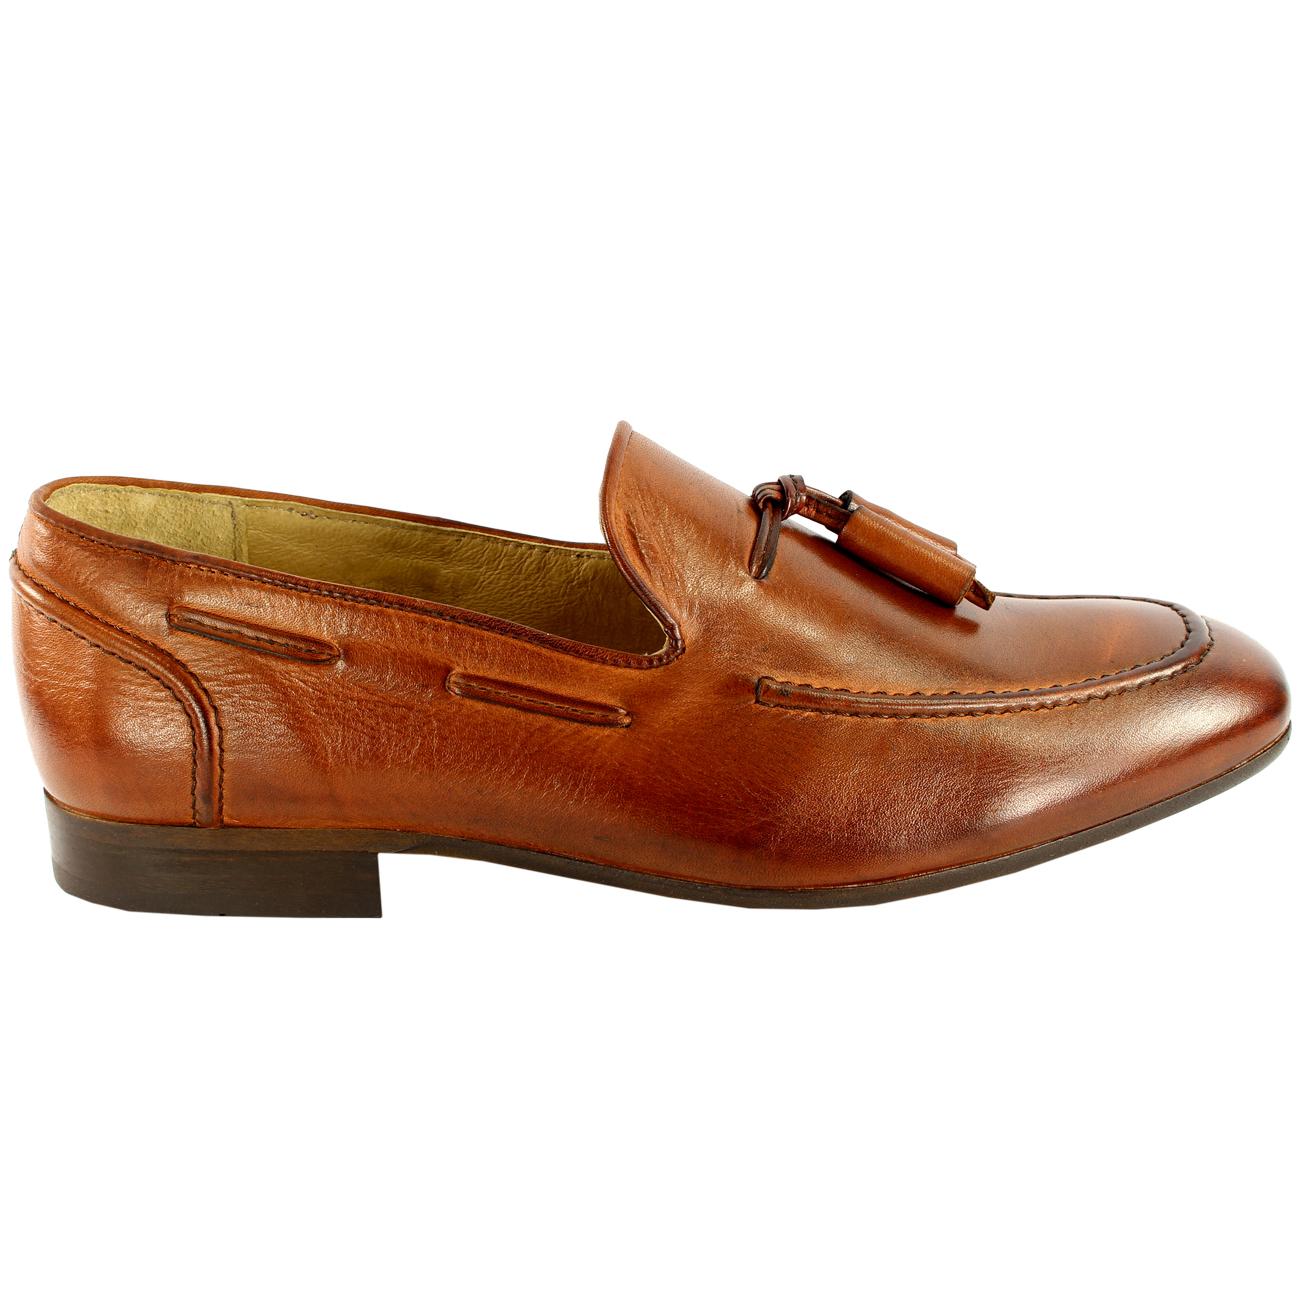 Mens H By Husdon Pierre Flats Flats Flats Tassle Loafer Smart schuhe Slip On New All Größes 809e75